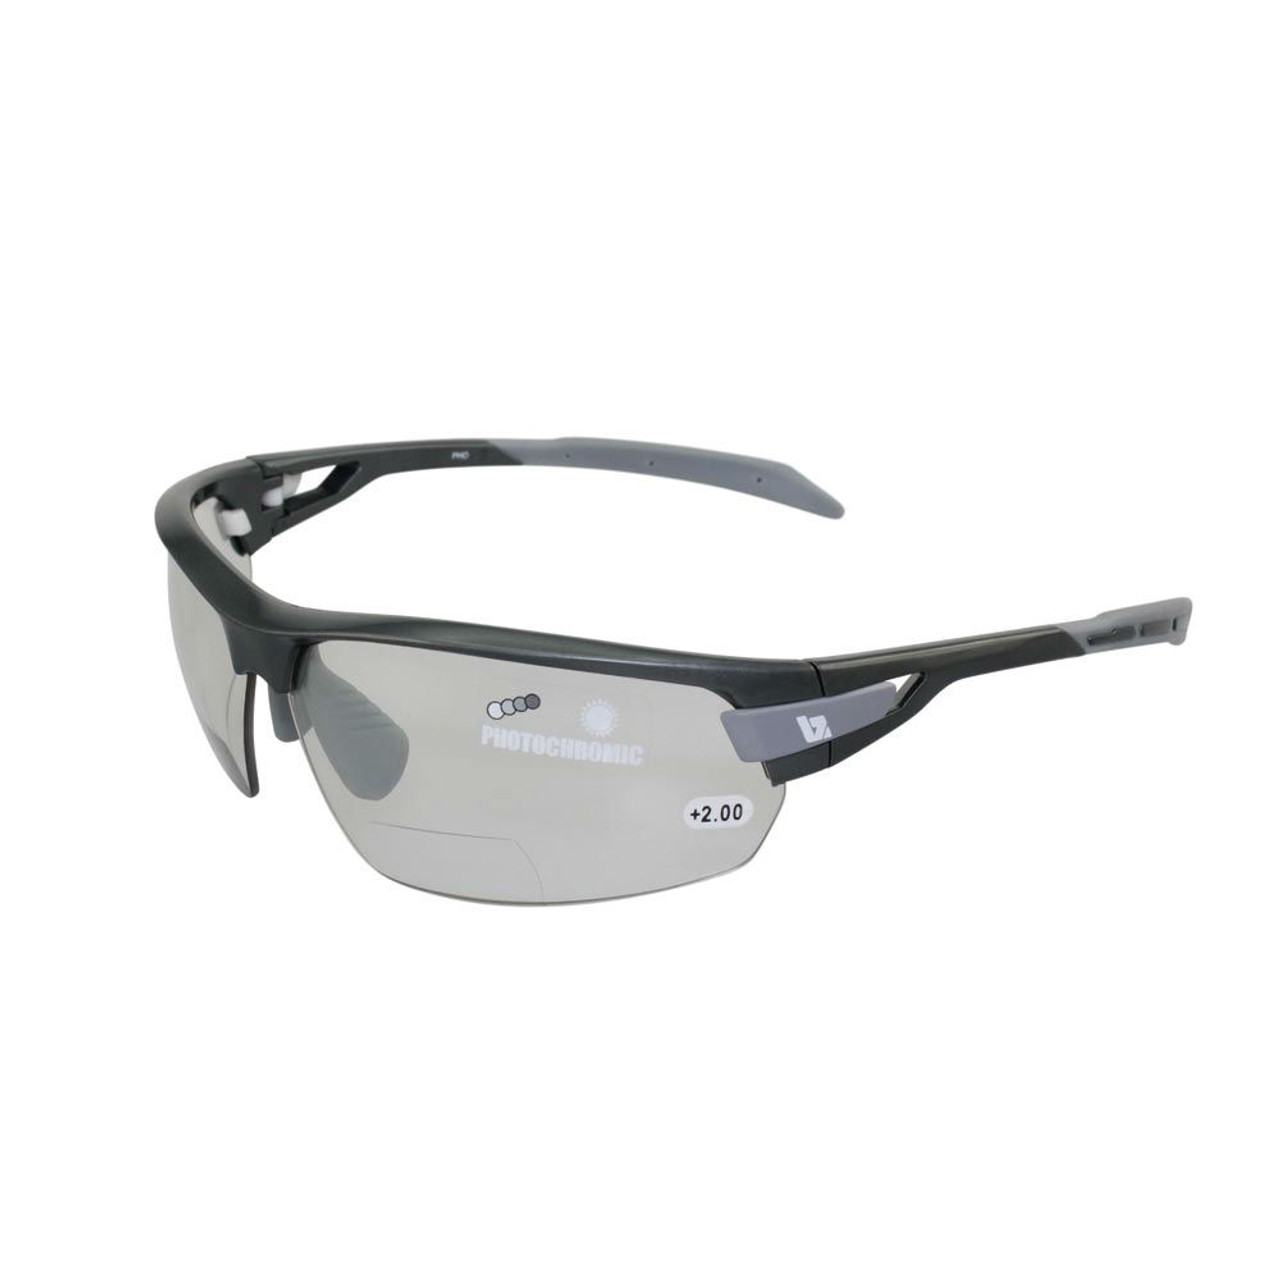 b4a72d6a86 BZ Optics Sports Sunglasses - PHO Graphite Frame - Photochromic Bi ...